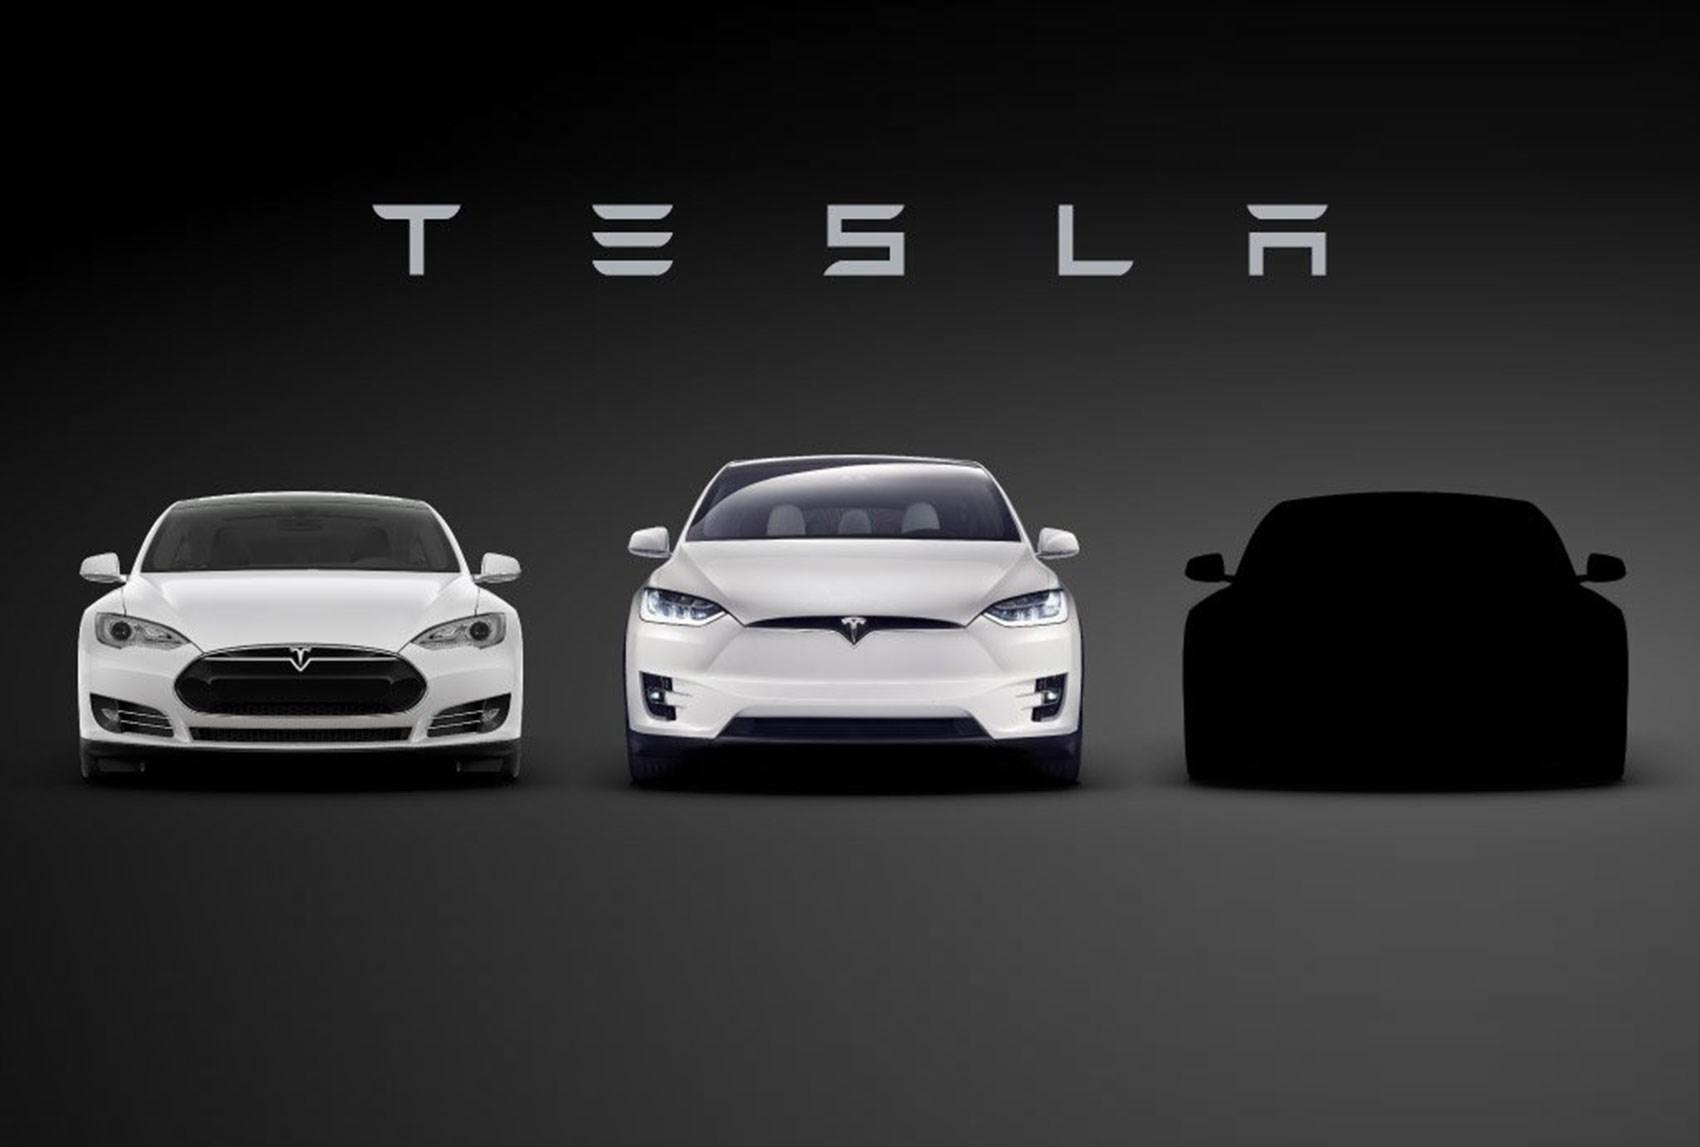 Tesla's new Model 3 Electric car to enter India - GaadiKey